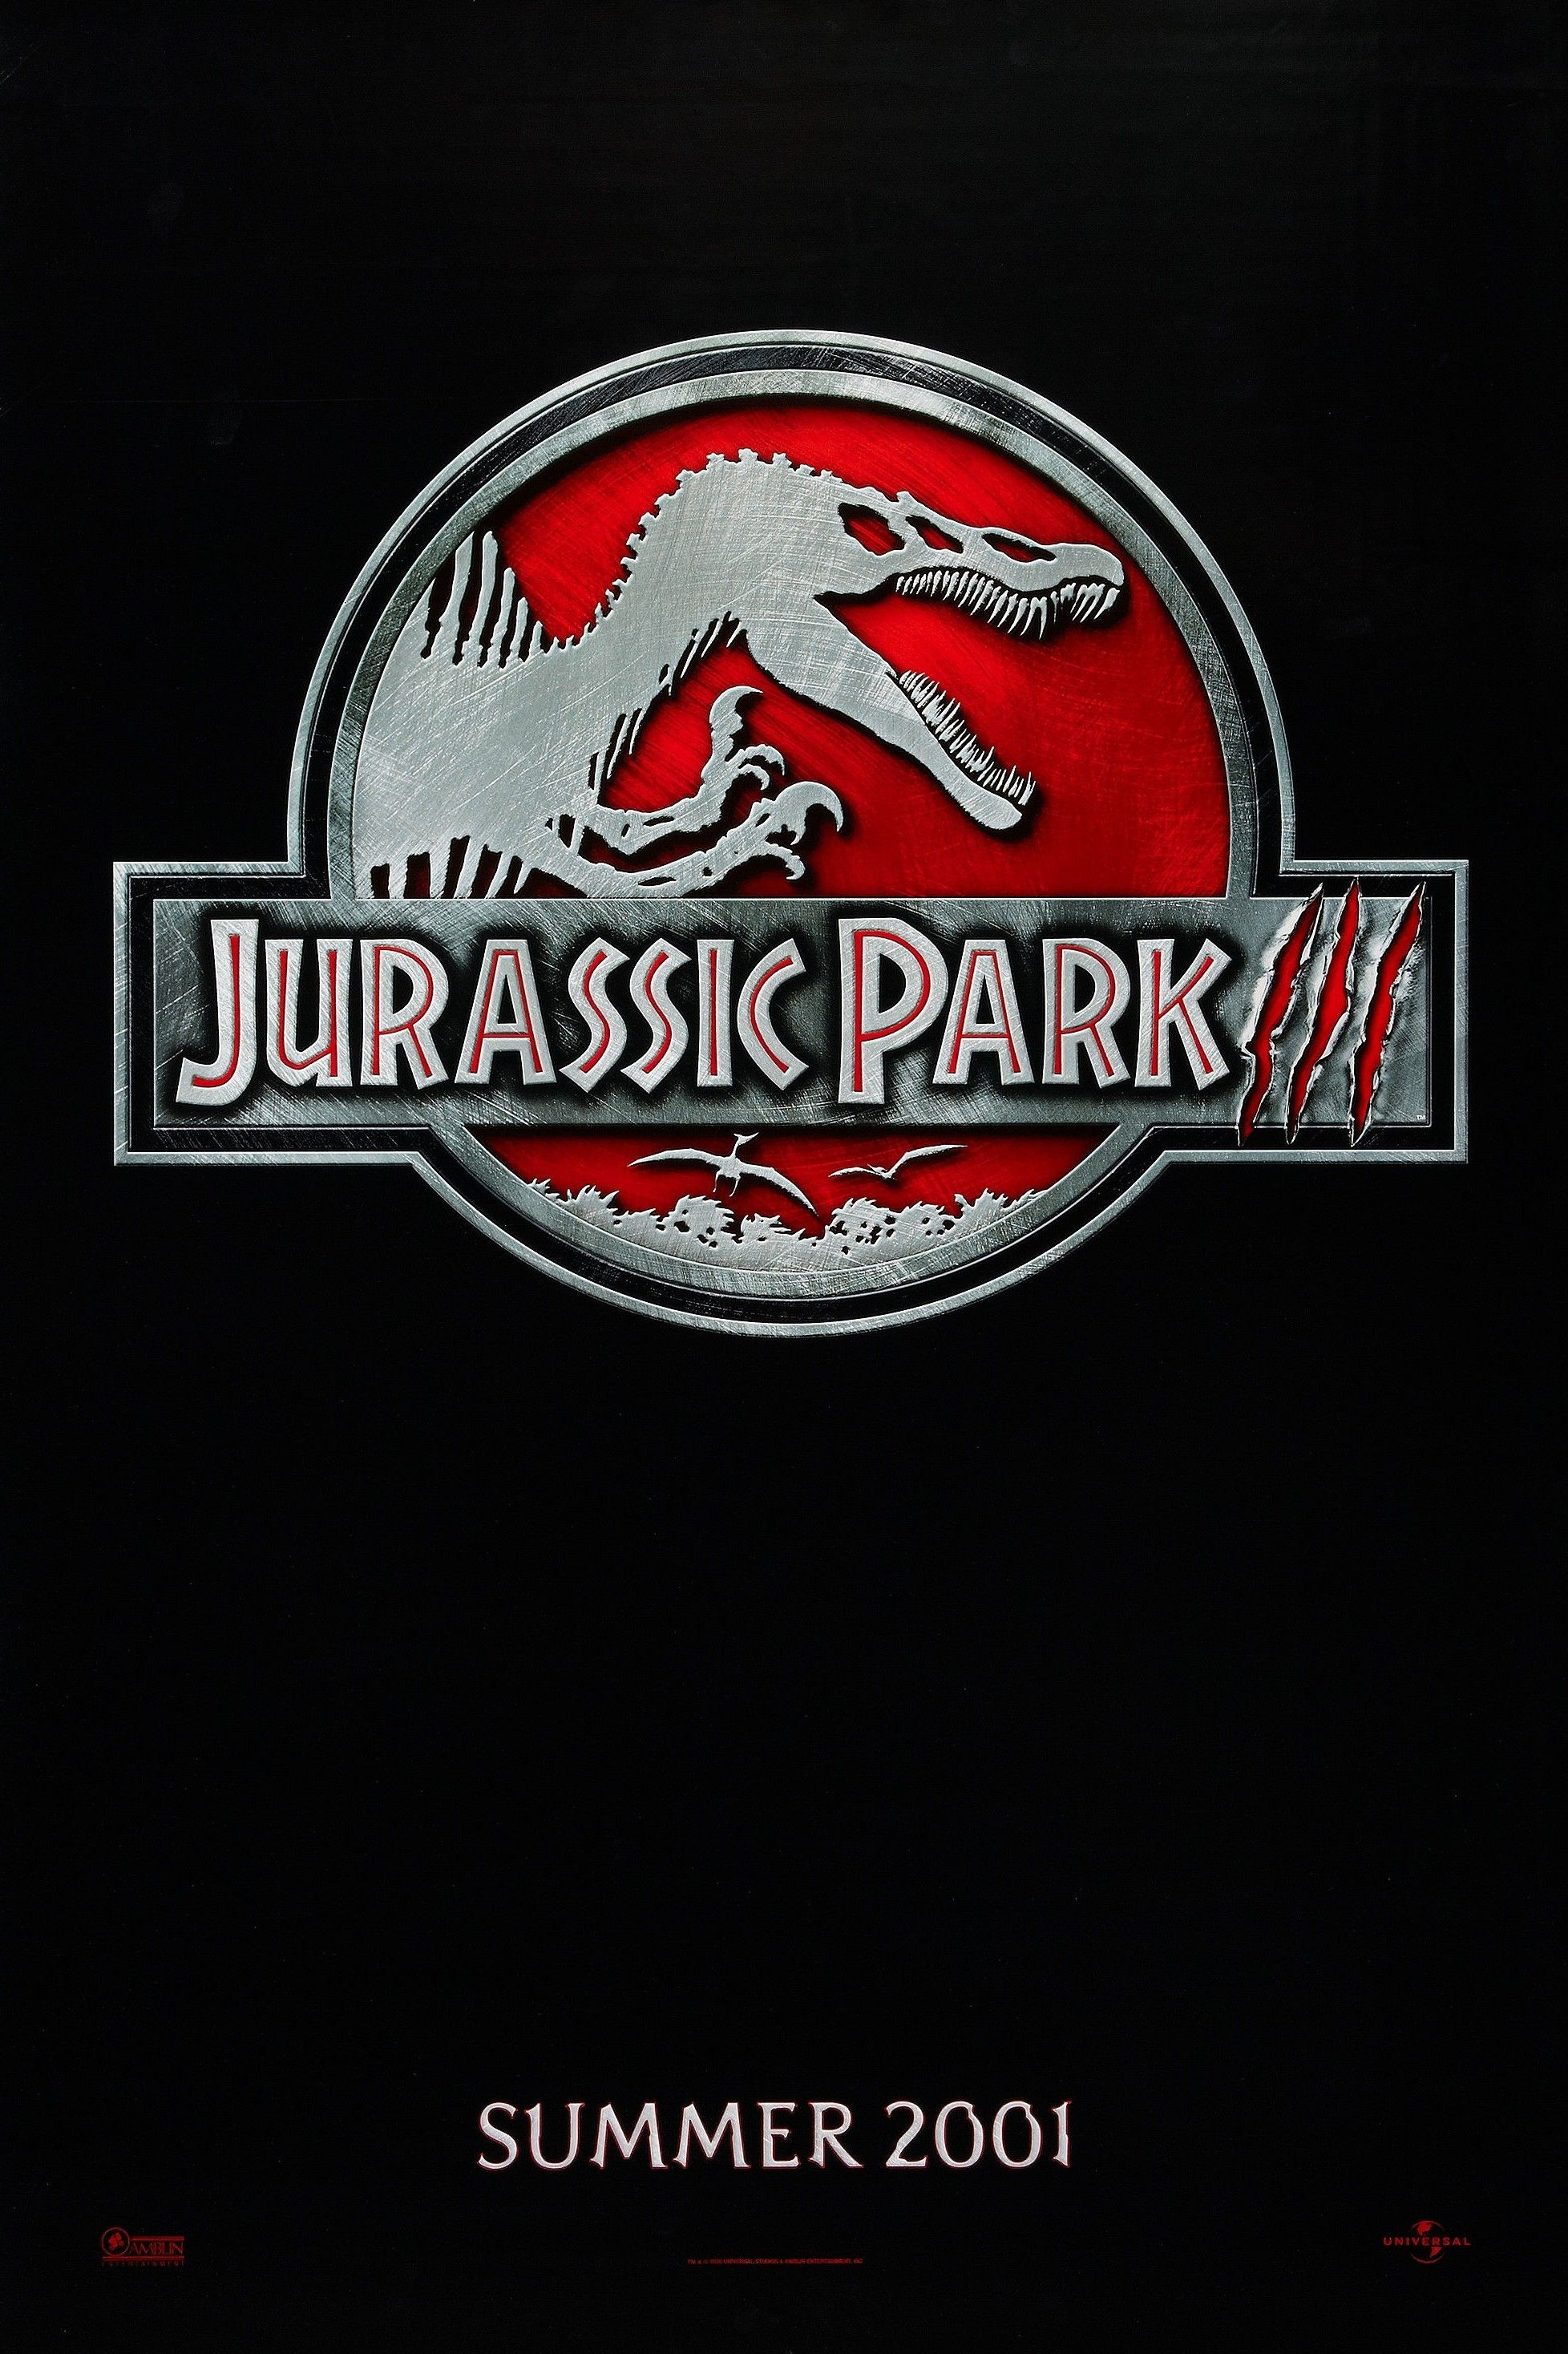 Jurassic Park Iii 2001 Jurassic Park